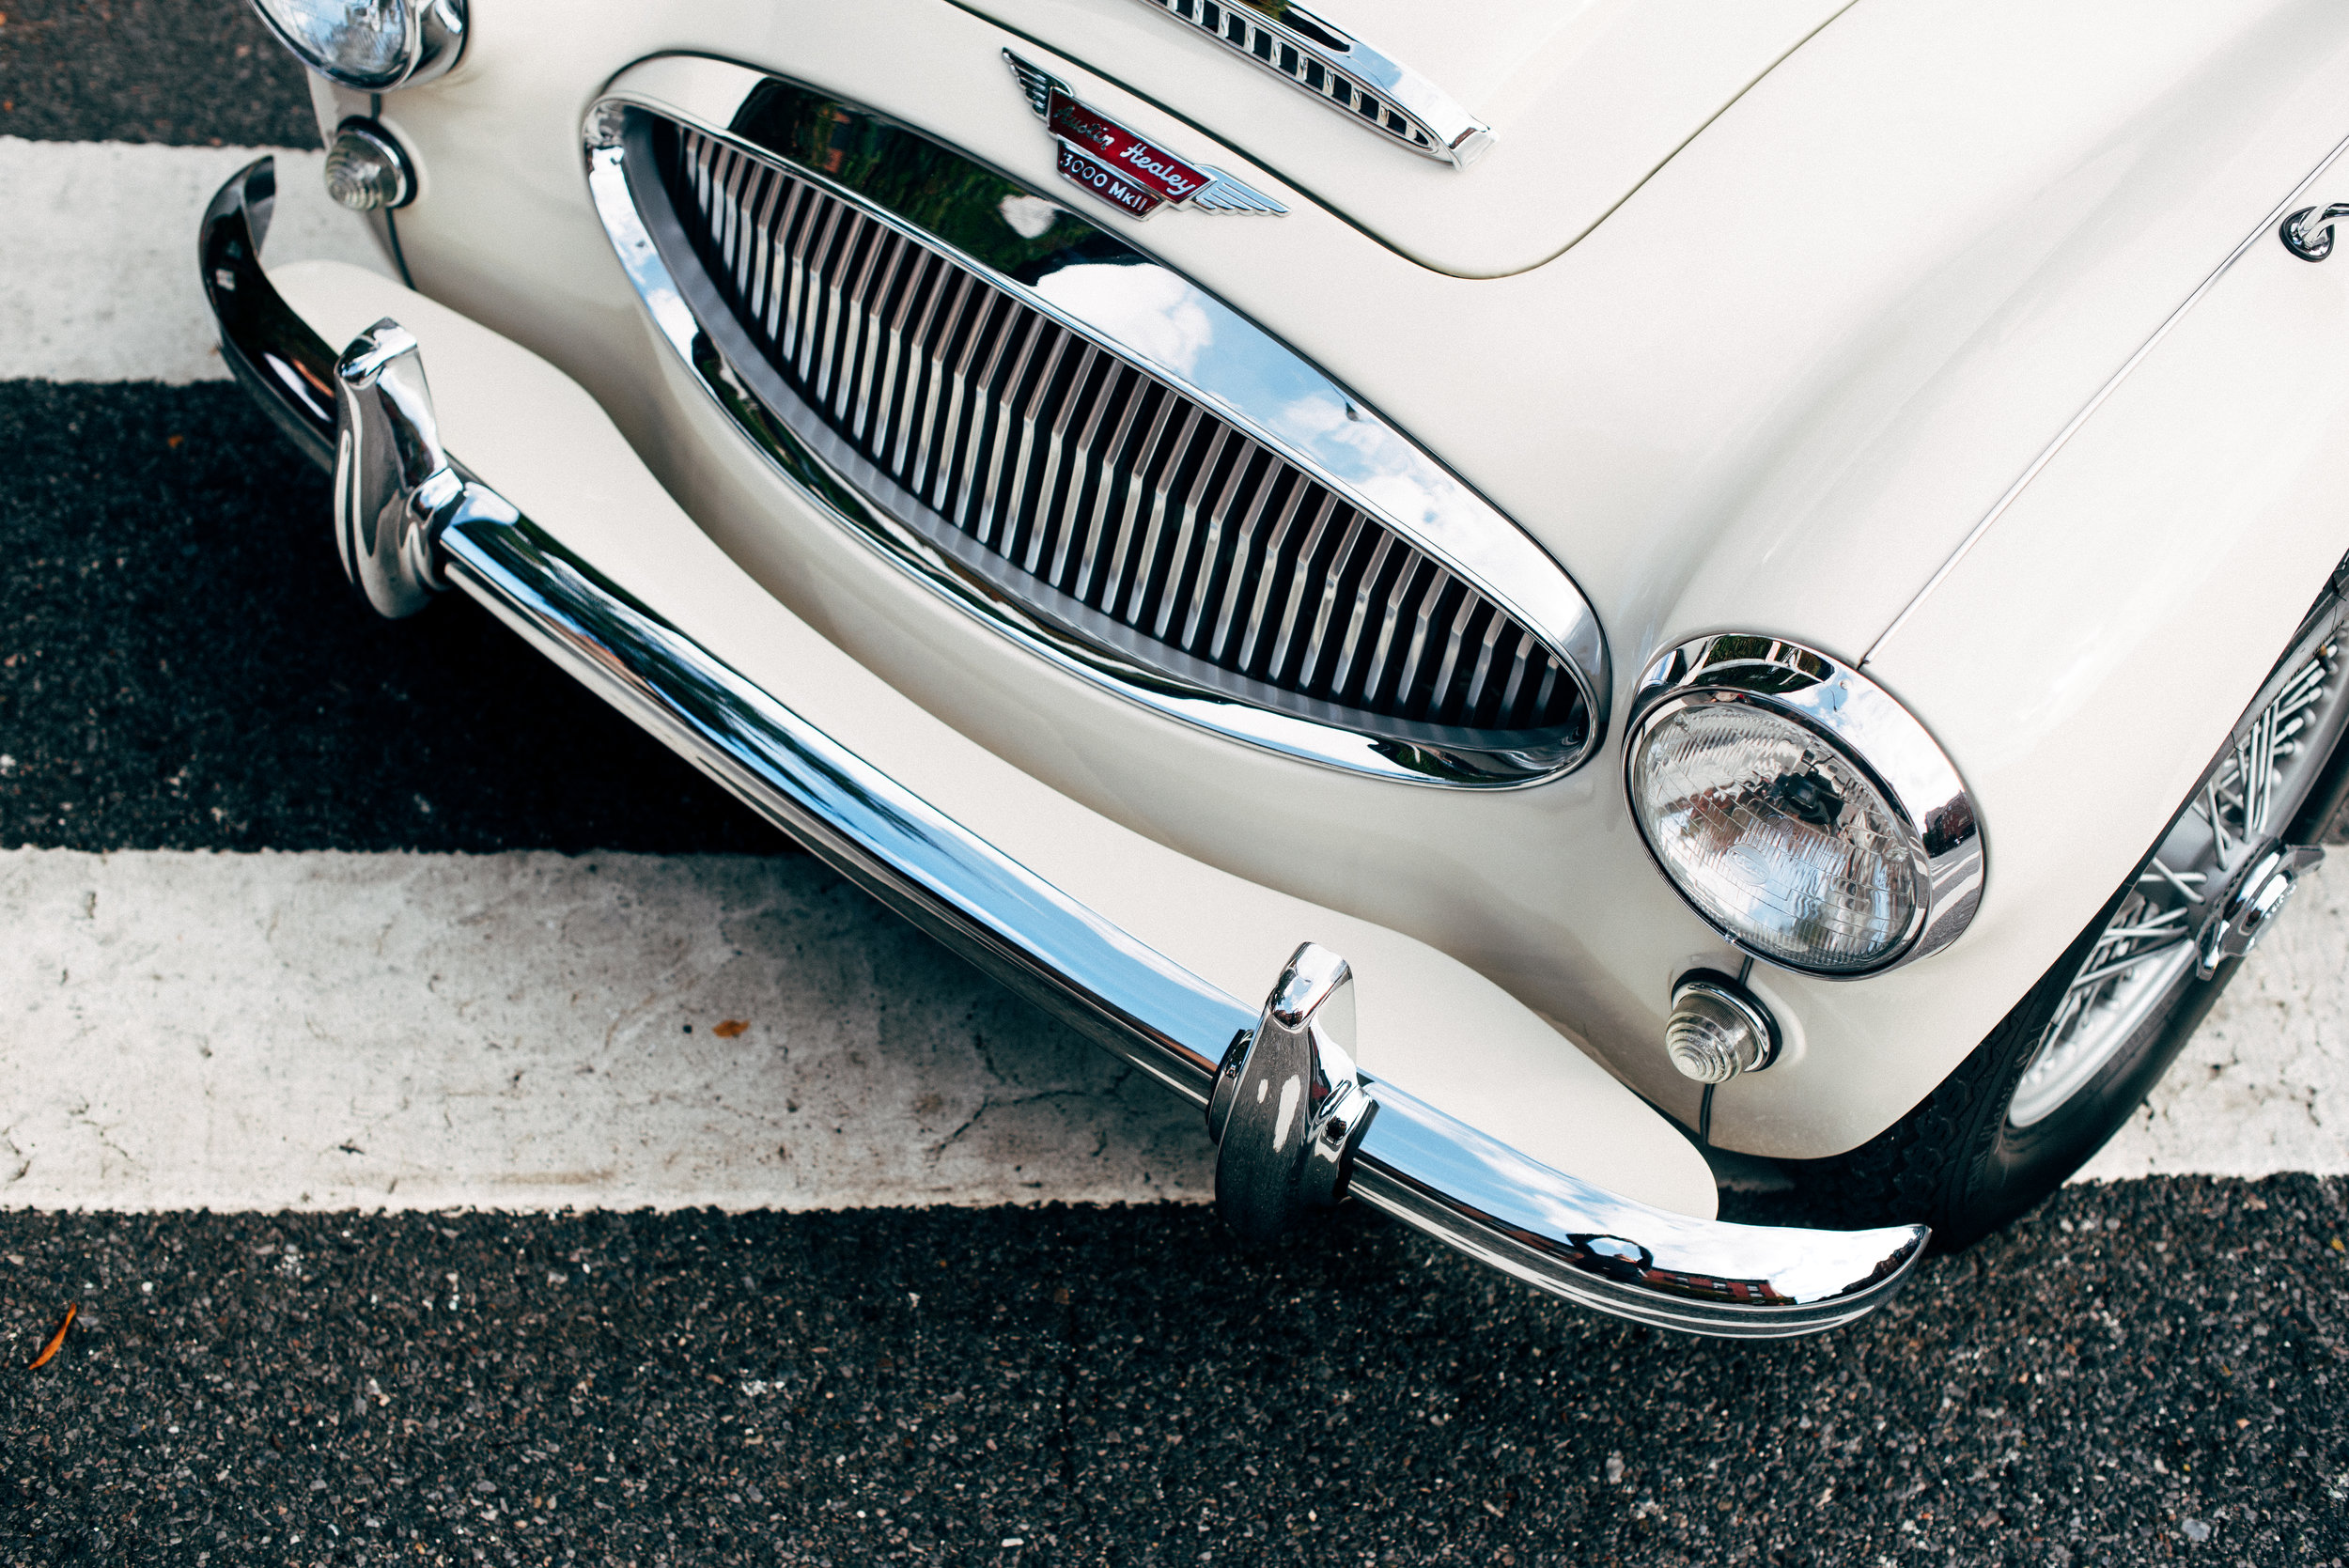 Cooper's Classic Cars